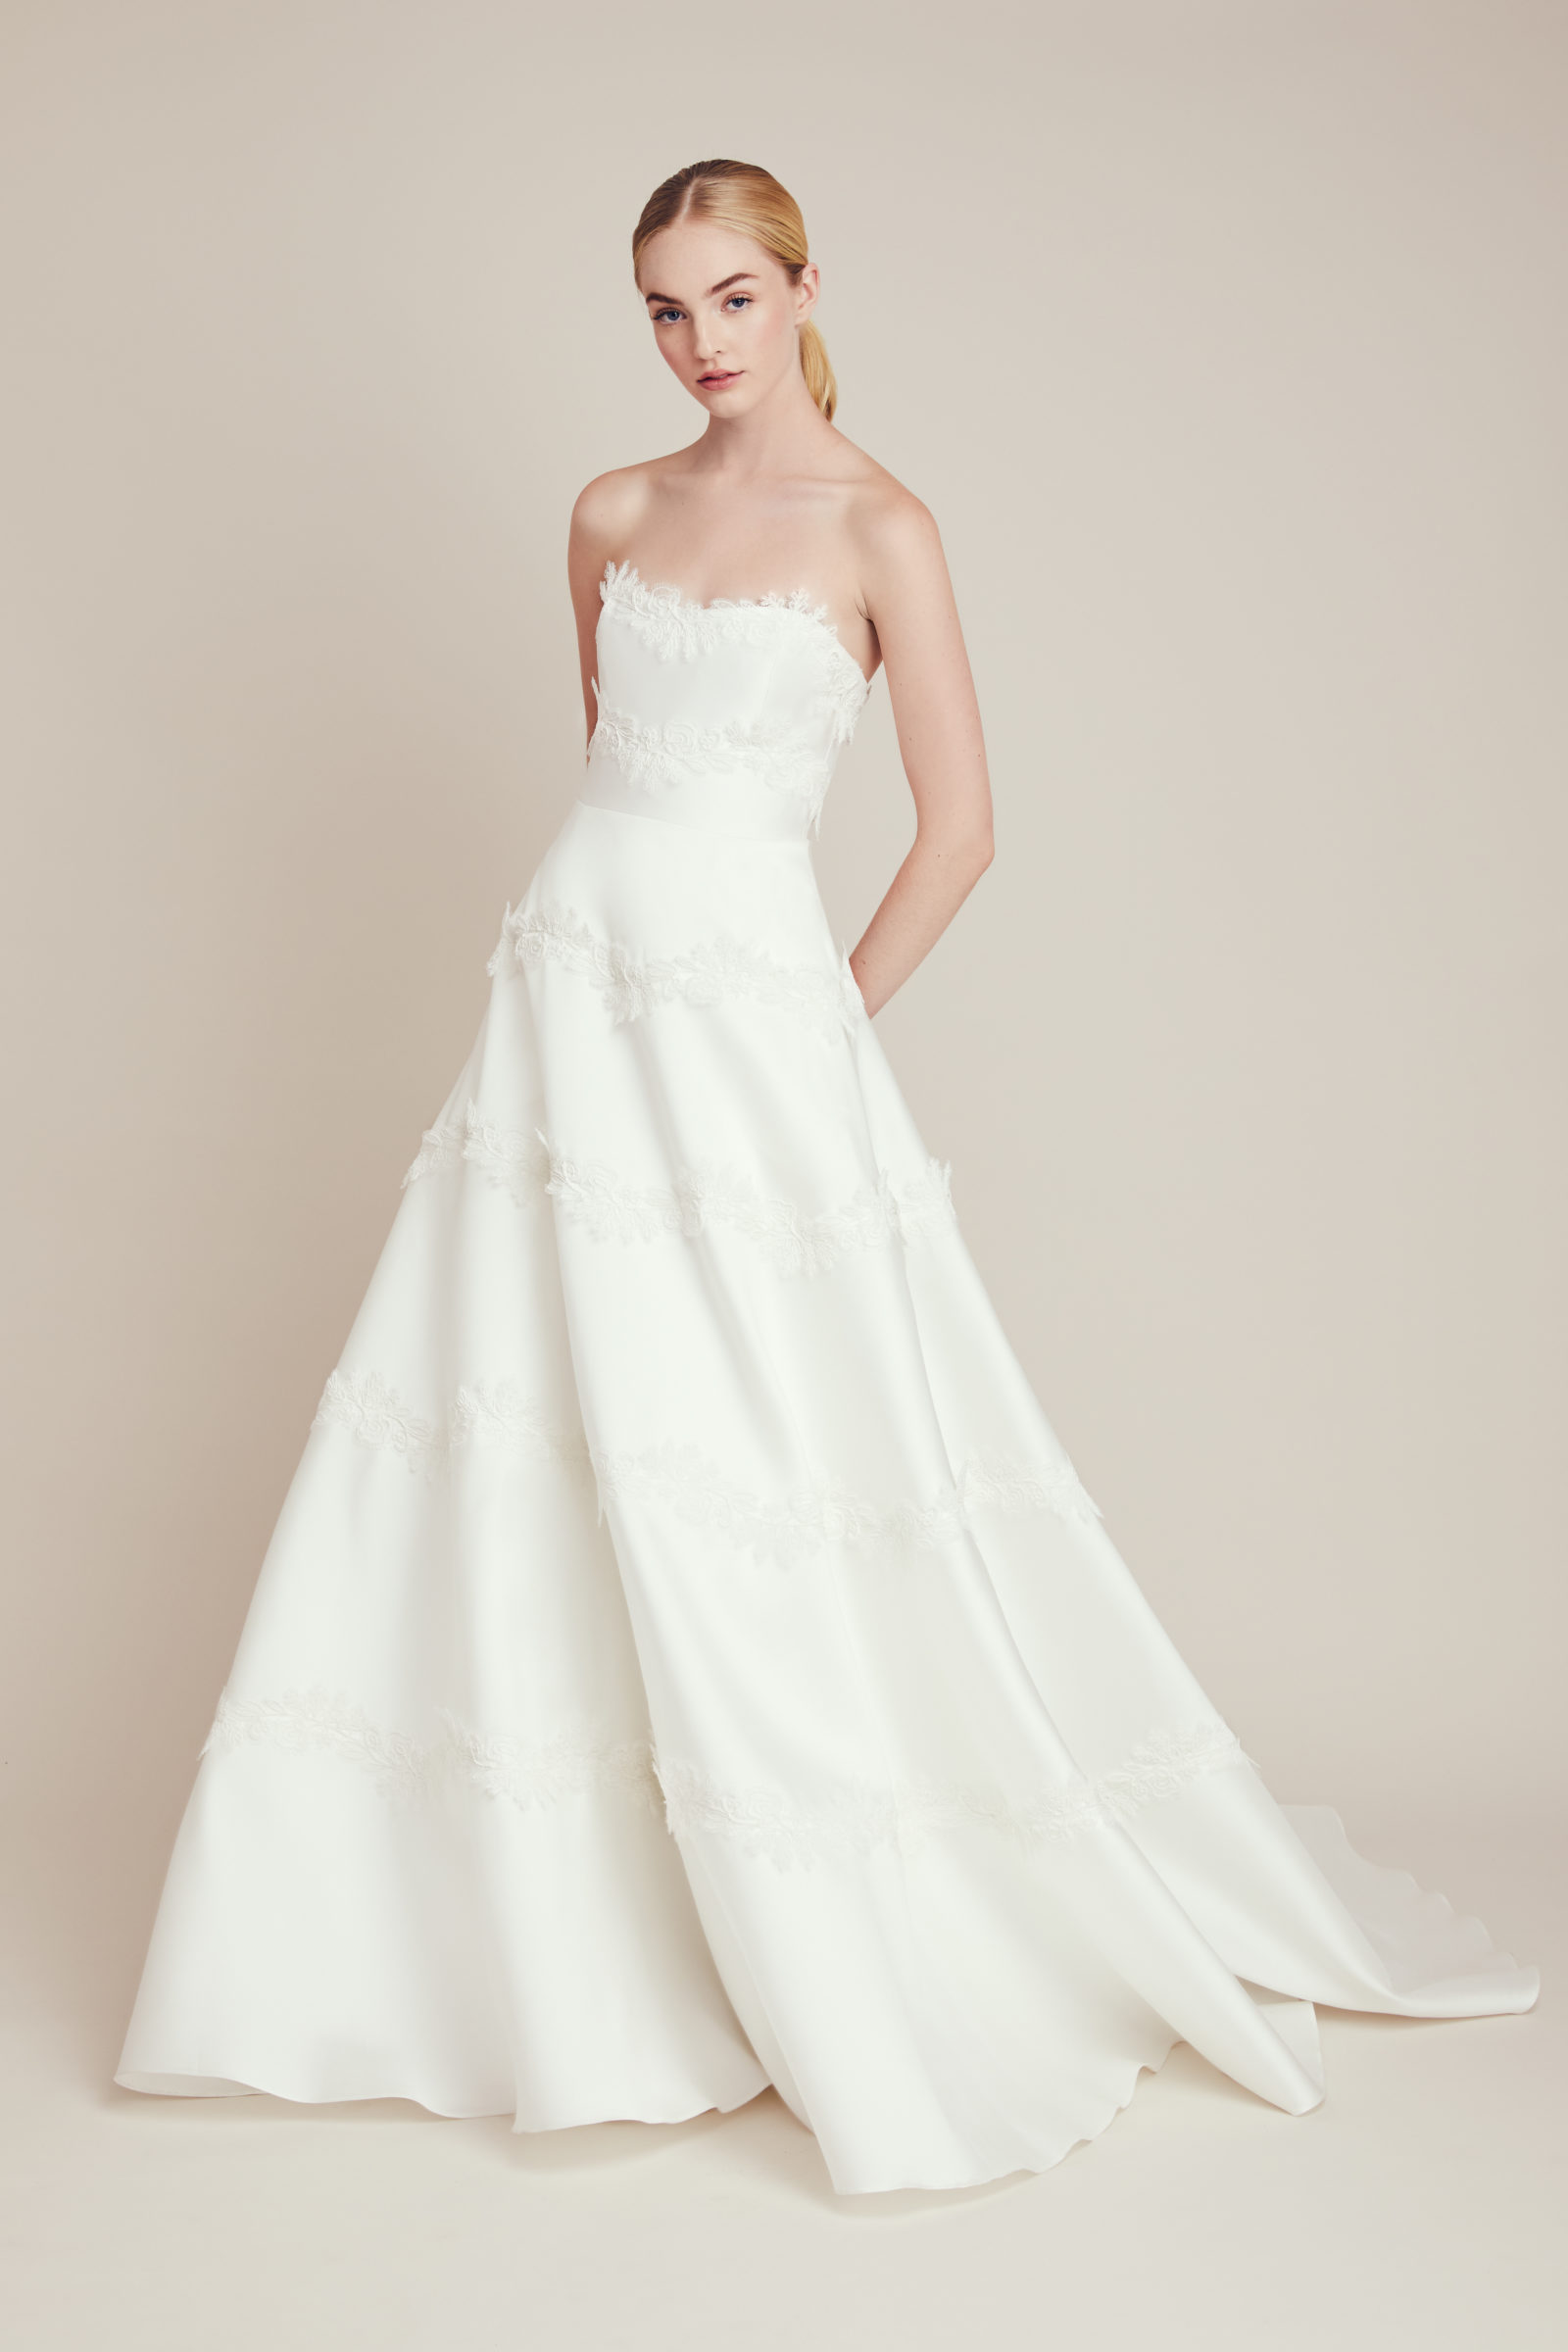 Lela Rose A-line bridal gown